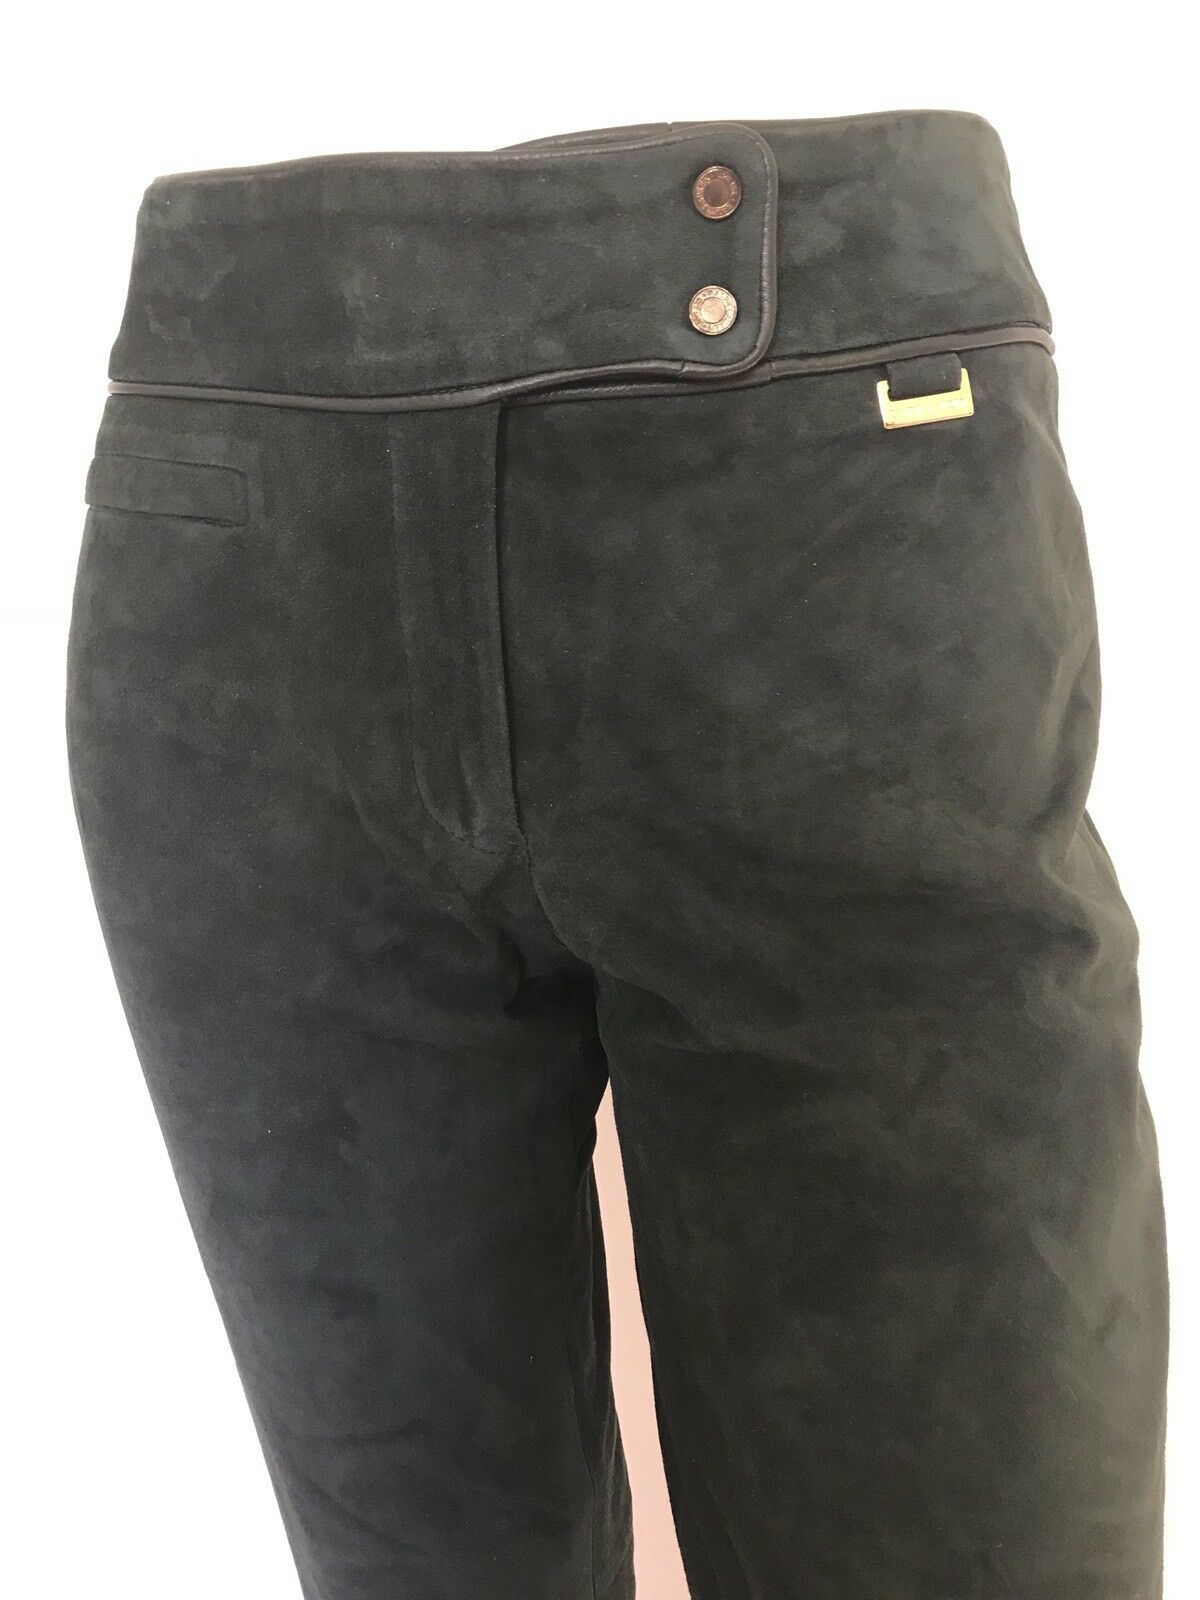 Ralph Lauren Woman's Pants Green Suede gold Hardware Straight US Sz 4